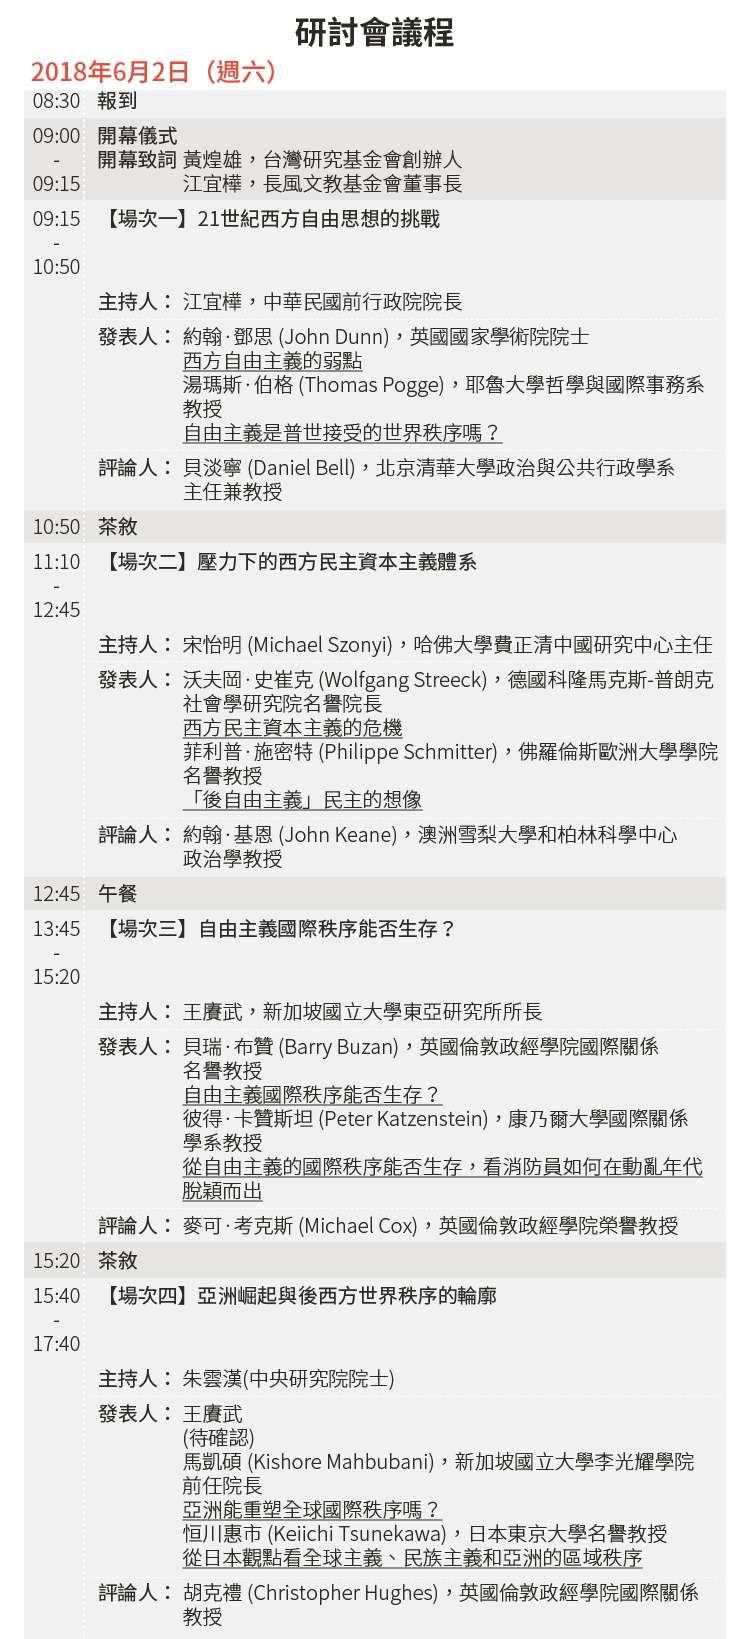 20180522-SMG0034-E01-研討會議程_2018年6月2日(週六)